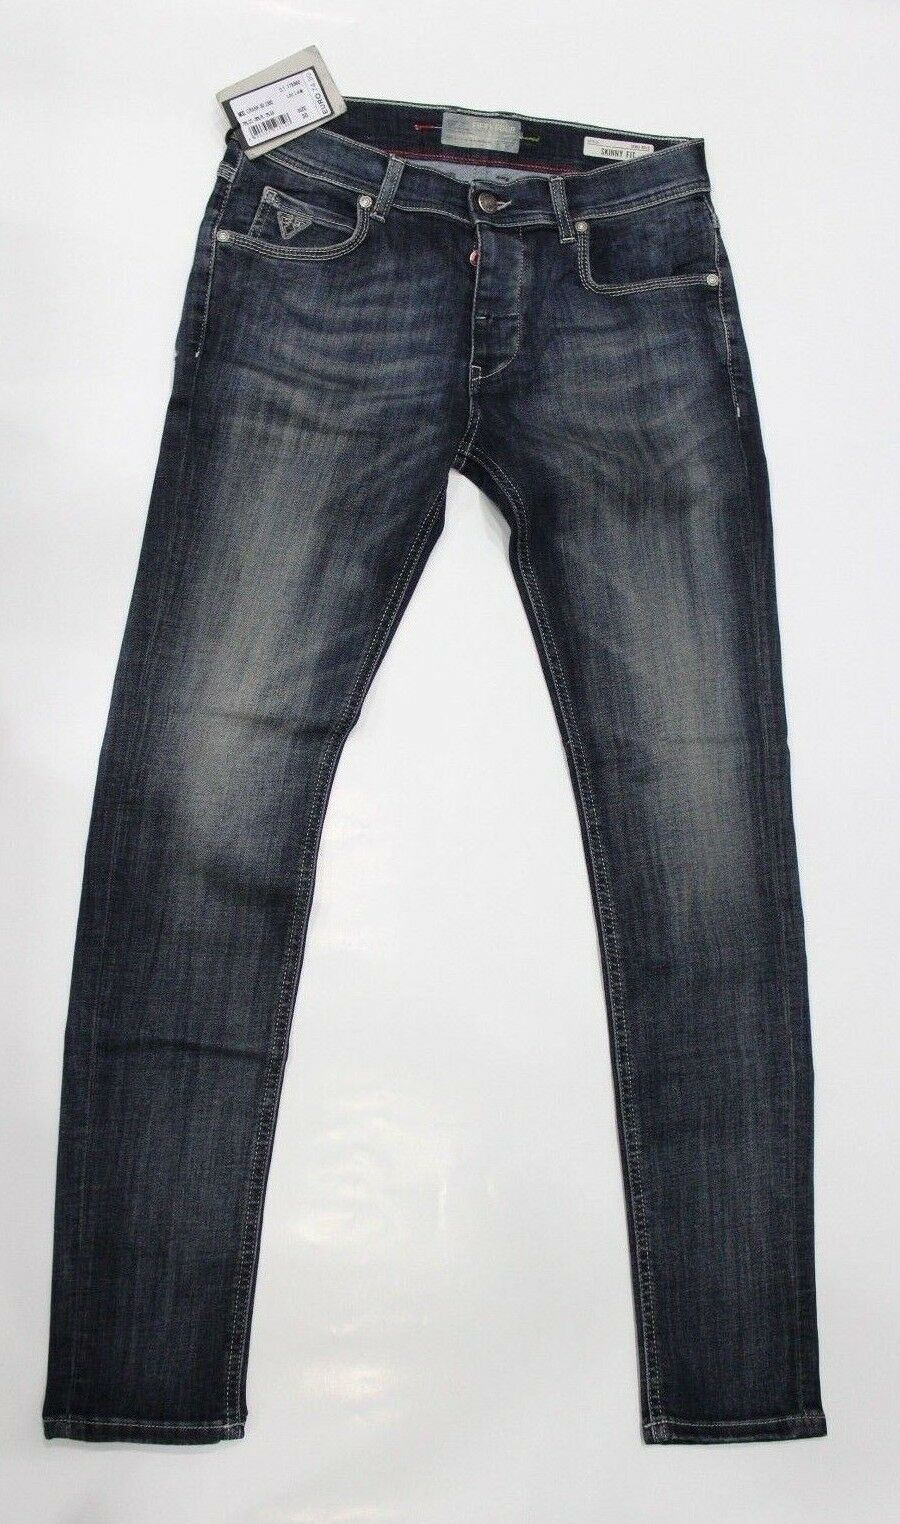 FIFTY FOUR Crank Jeans Pantalone Pantalone Pantalone Uomo Skinny Fit edc42b